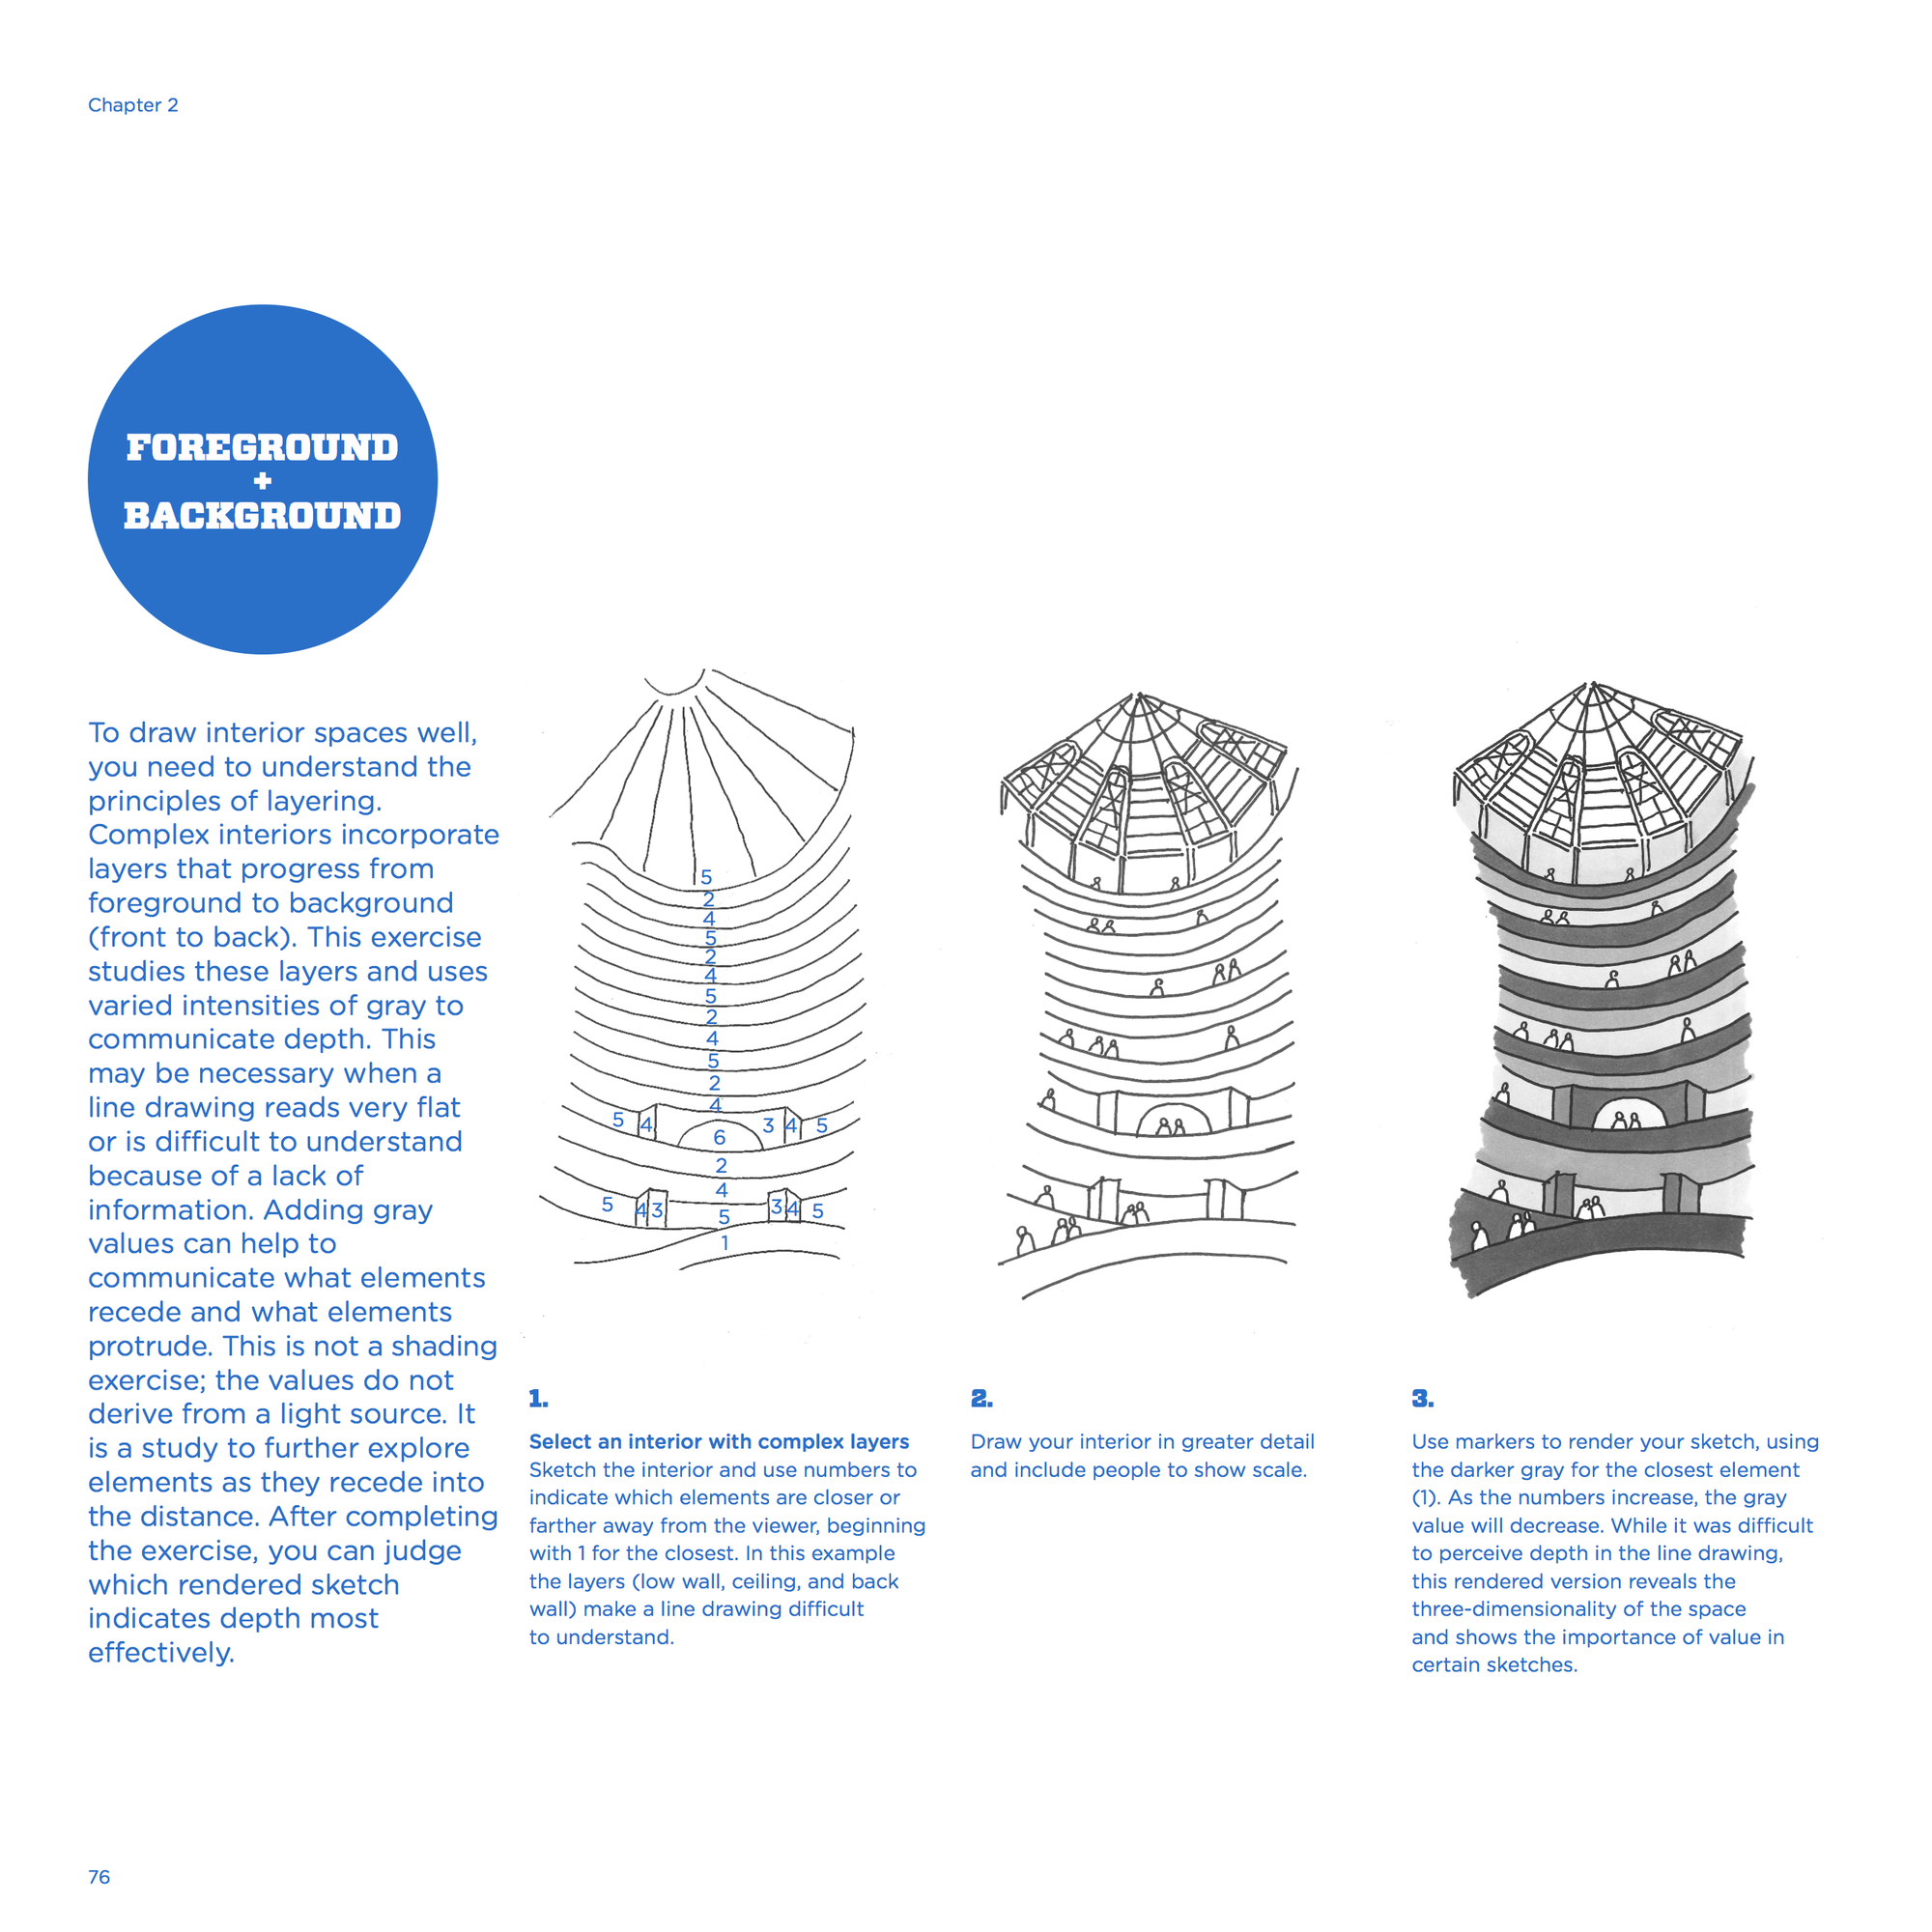 83 Elements Interior Design Limited Best 25 Wood Interior Design Ideas Only On Pinterest